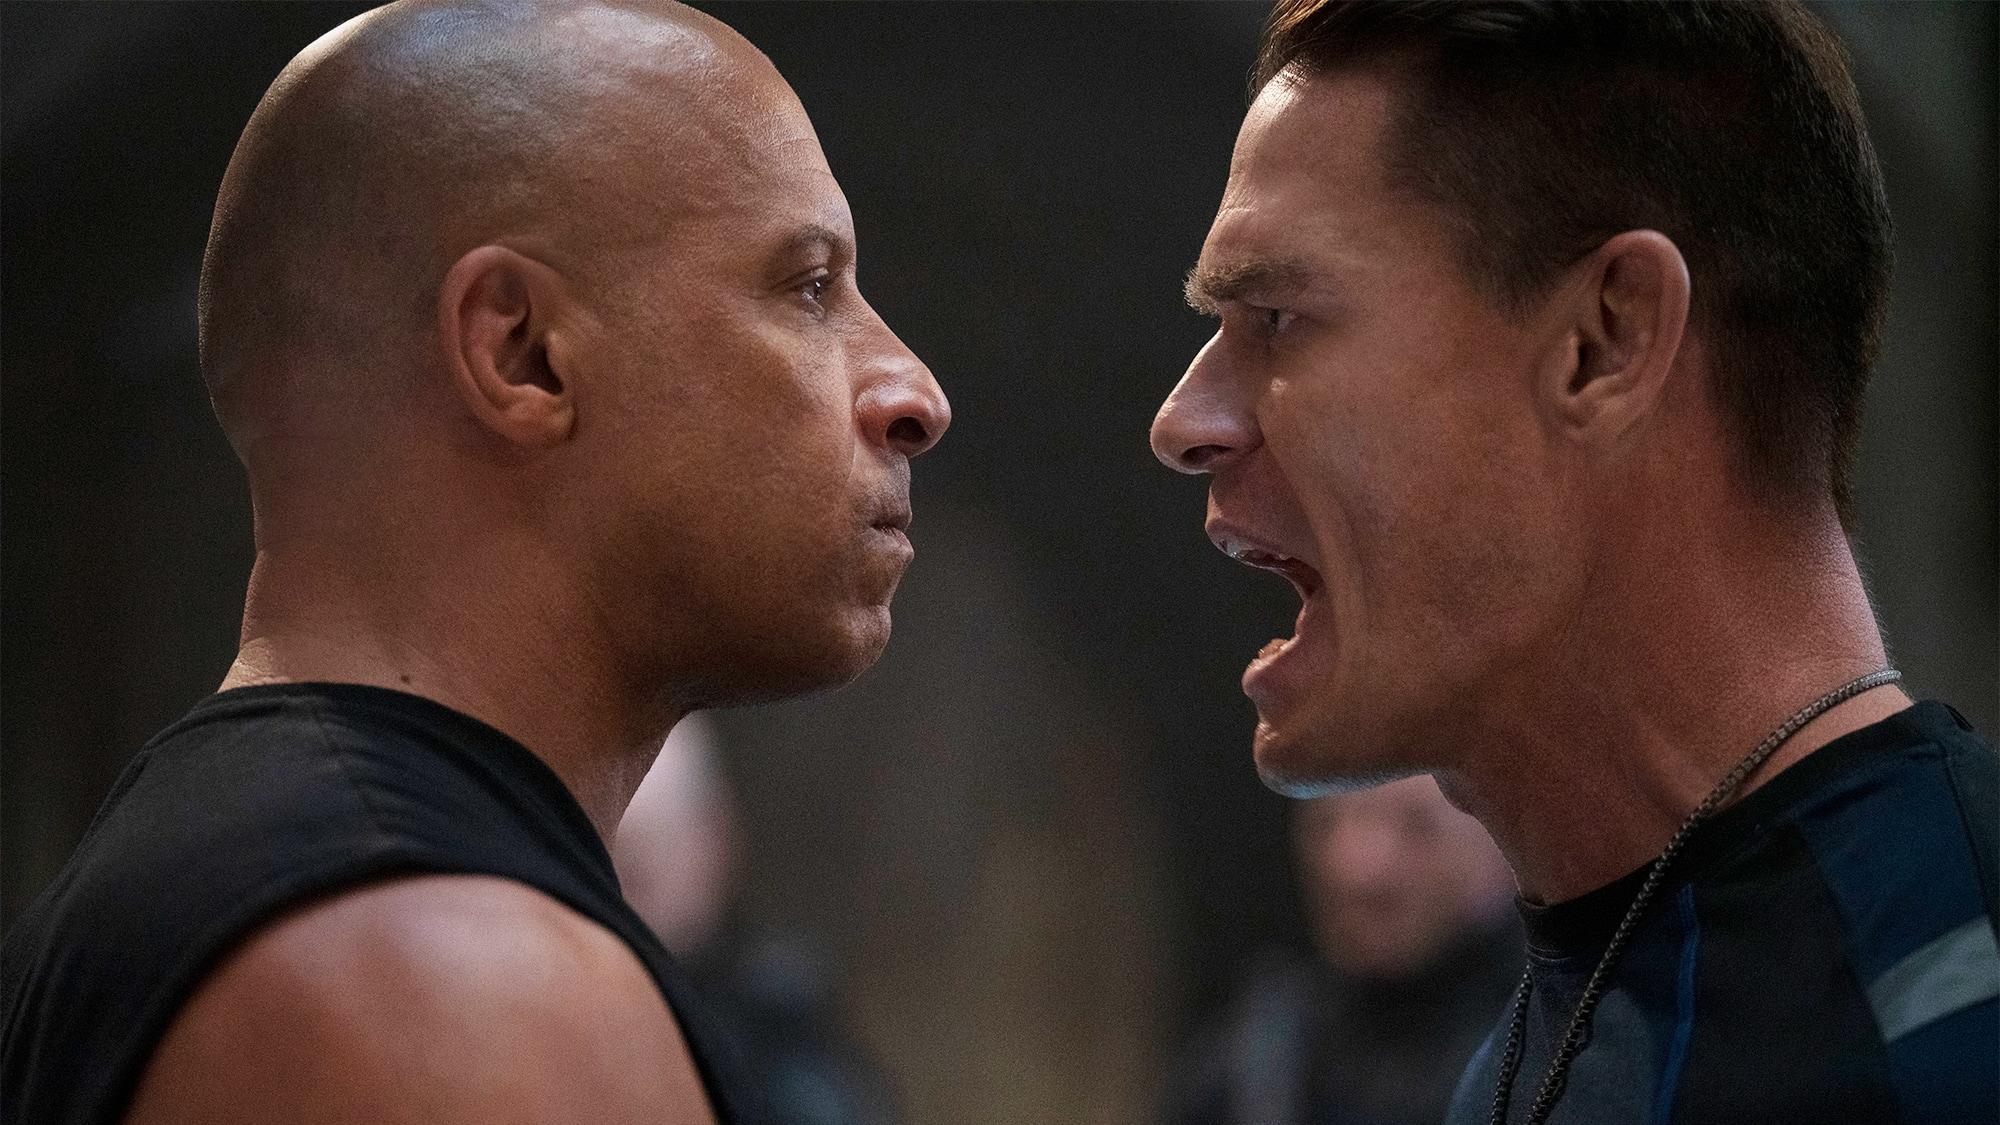 Vin Diesel's F9: The Fast Saga smashes pandemic-era opening record